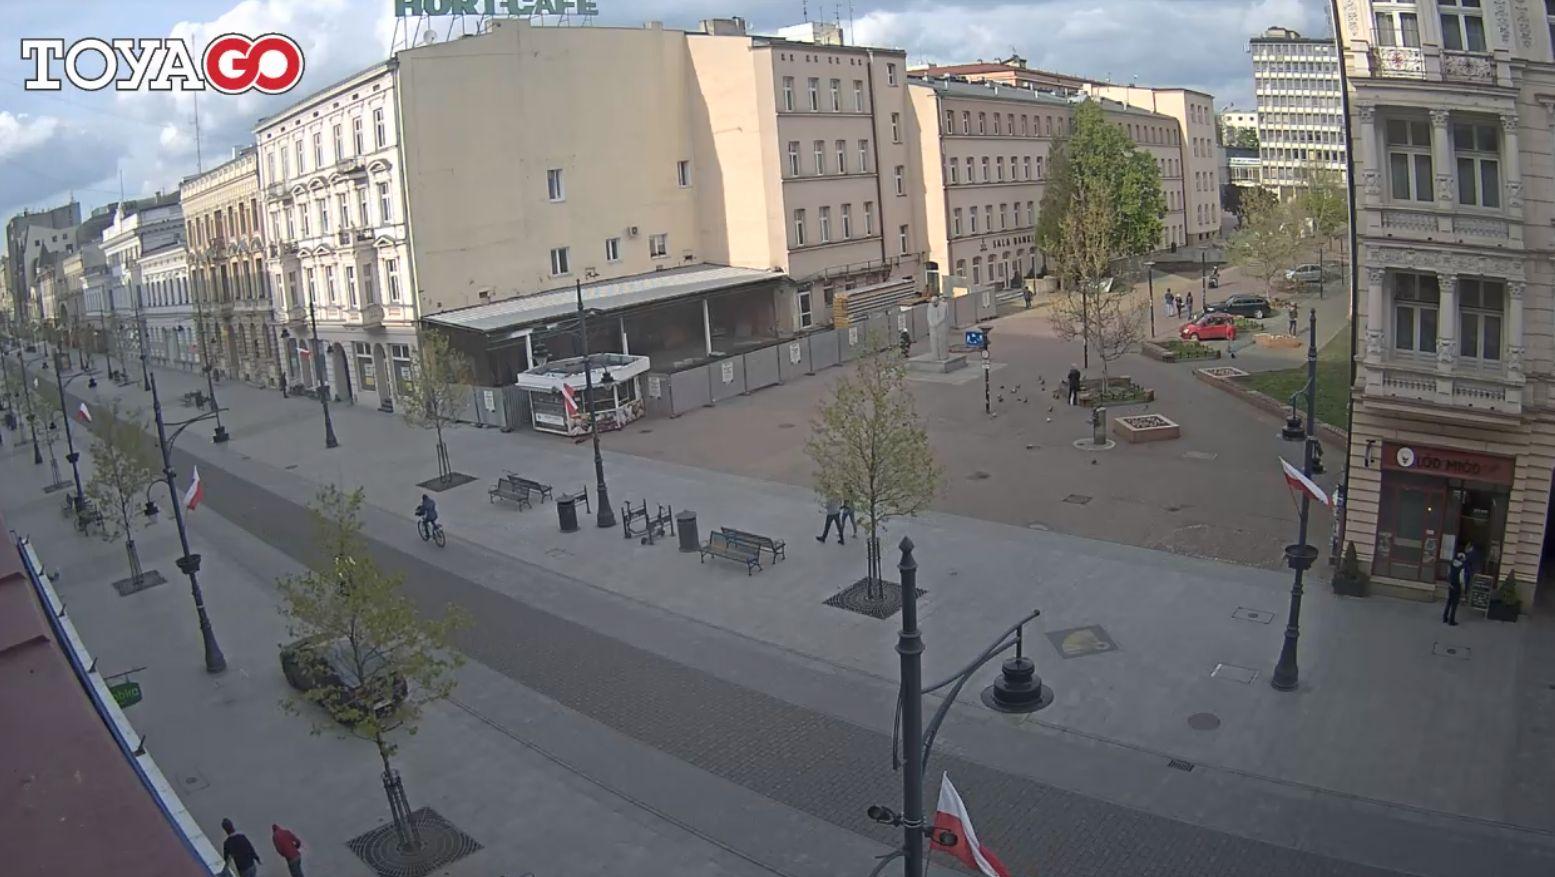 Łódź, ul. Piotrkowska – al. Leona Schillera